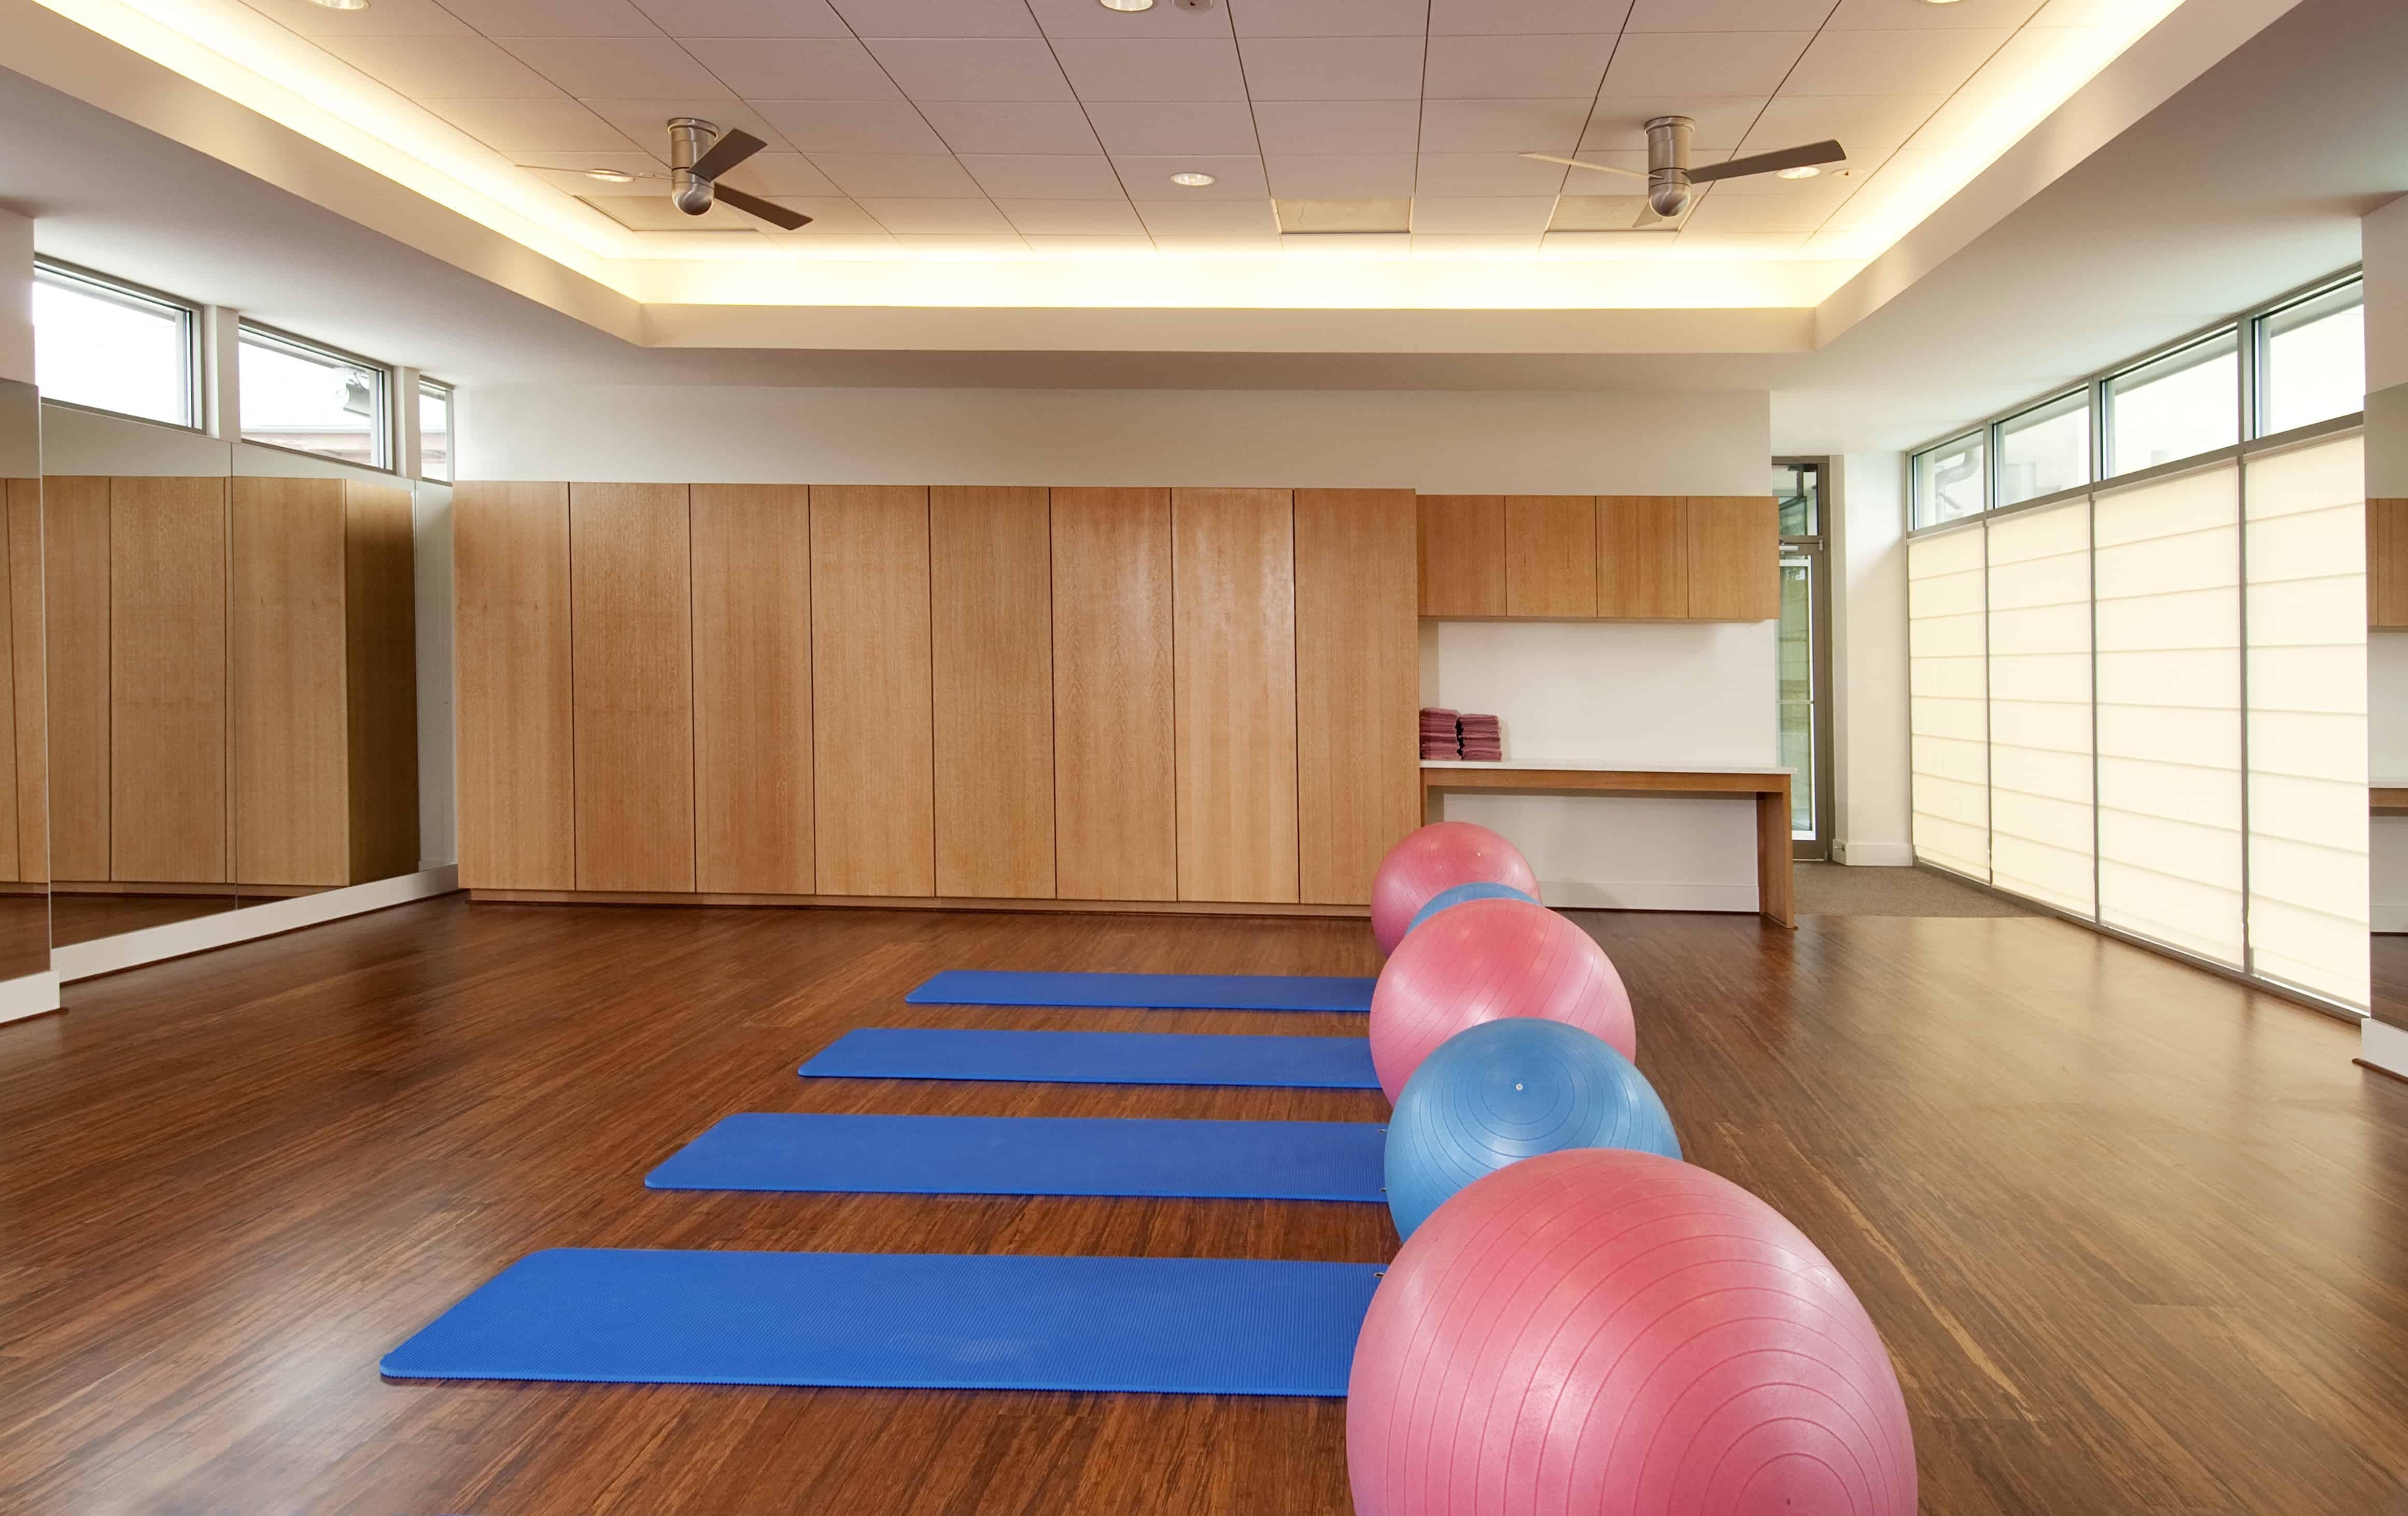 pilates and yoga room design